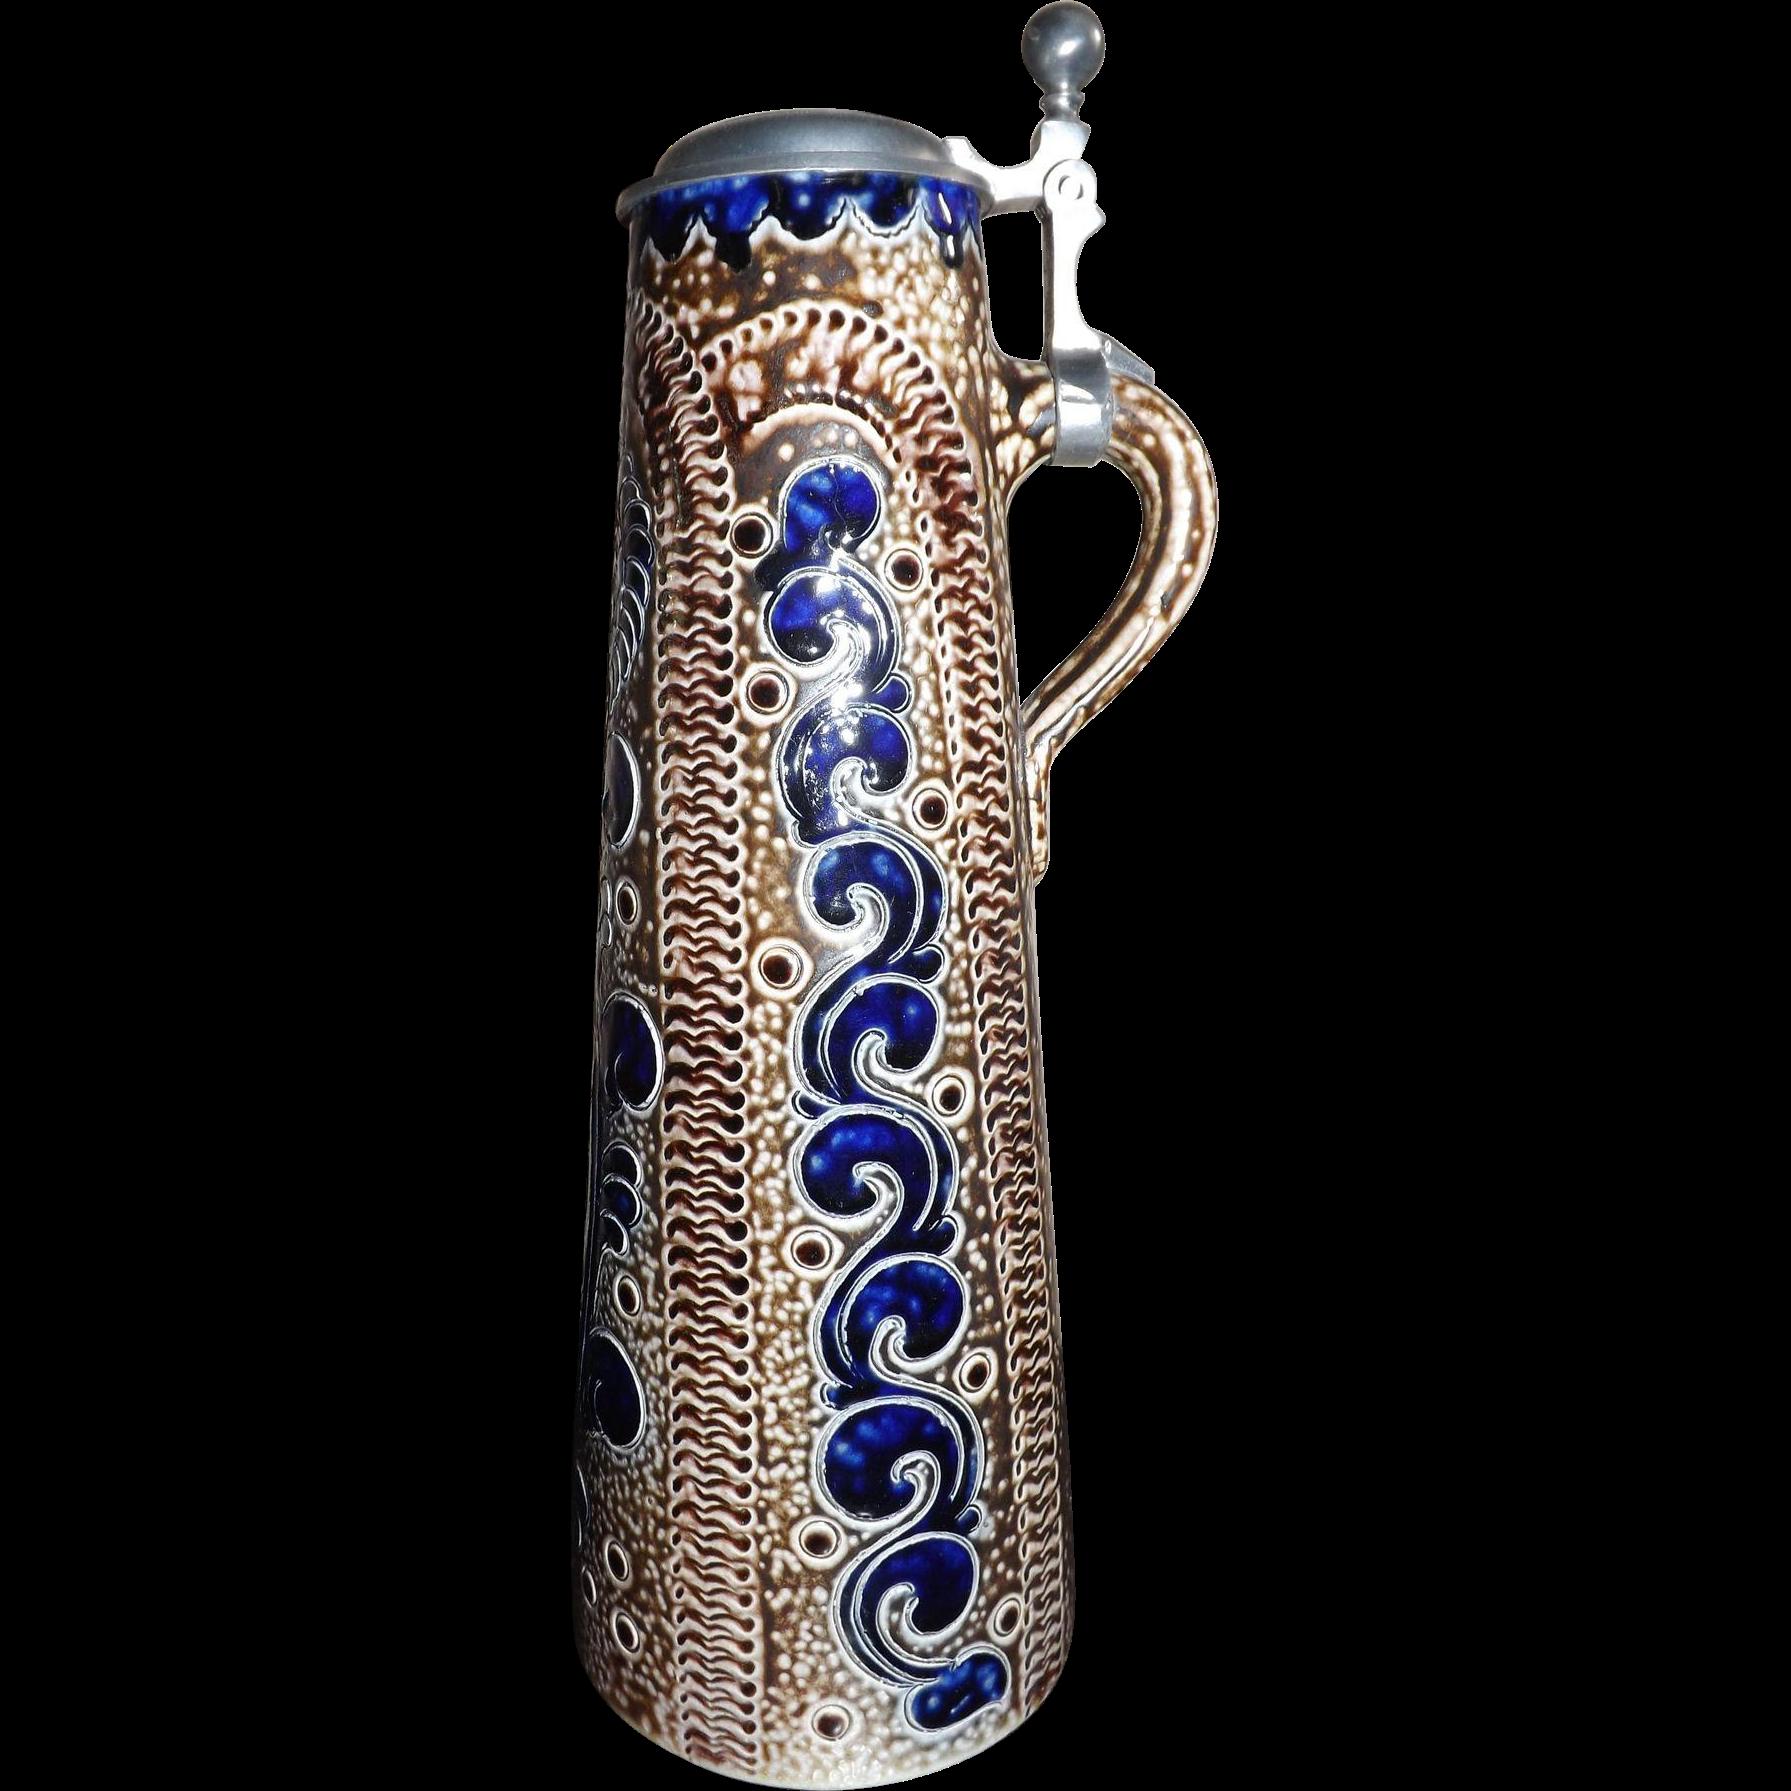 Rare Tall Vintage Merkelbach Grenzhausen Cobalt Art Nouveau Glazed Stein